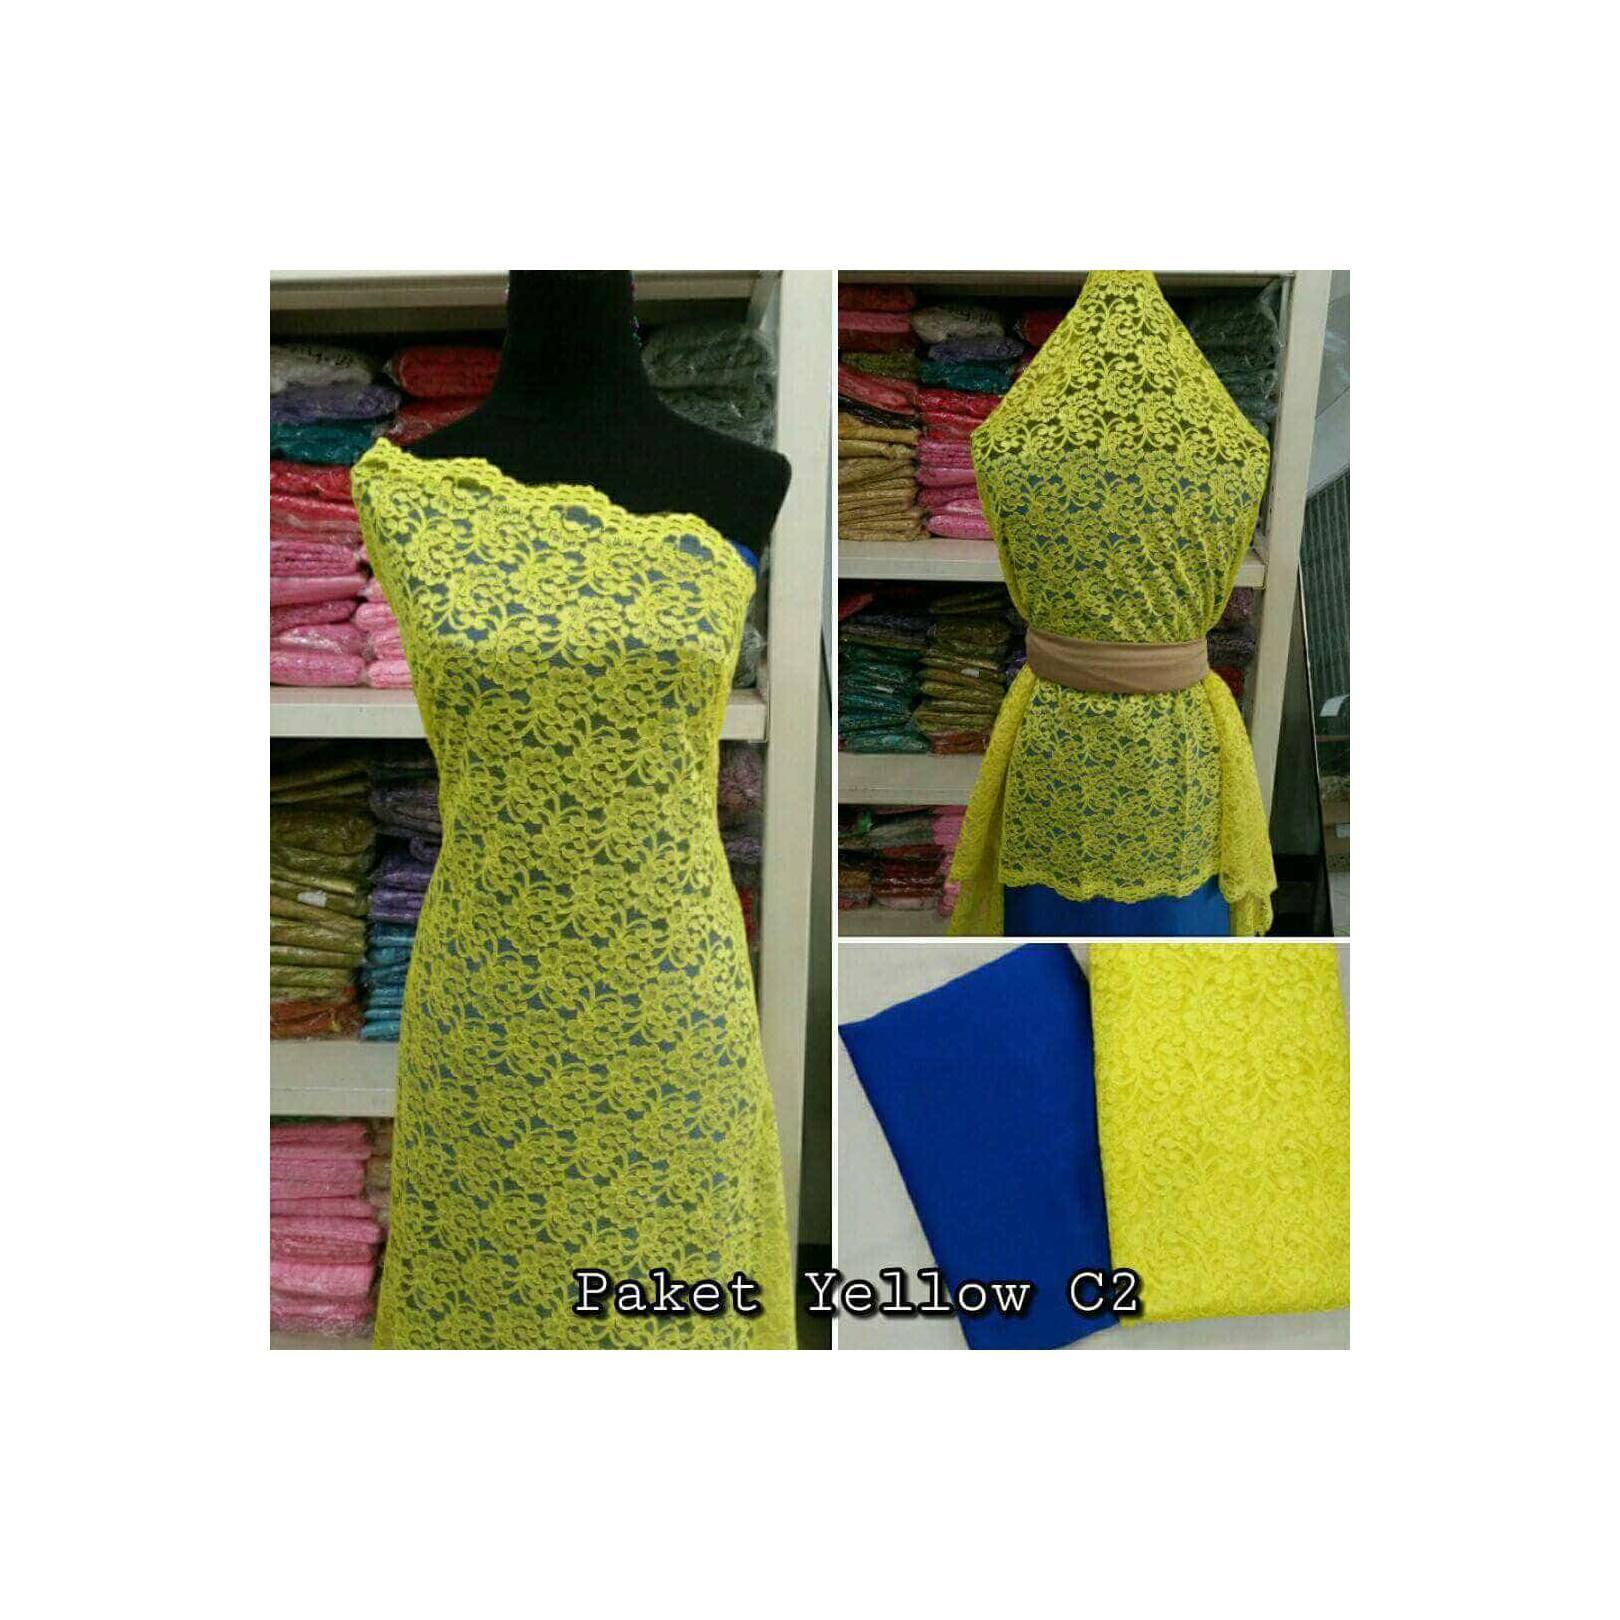 Brokat Brukat Bahan Kain Kebaya Dress Gaun Gamis Couple Paket Yello C2